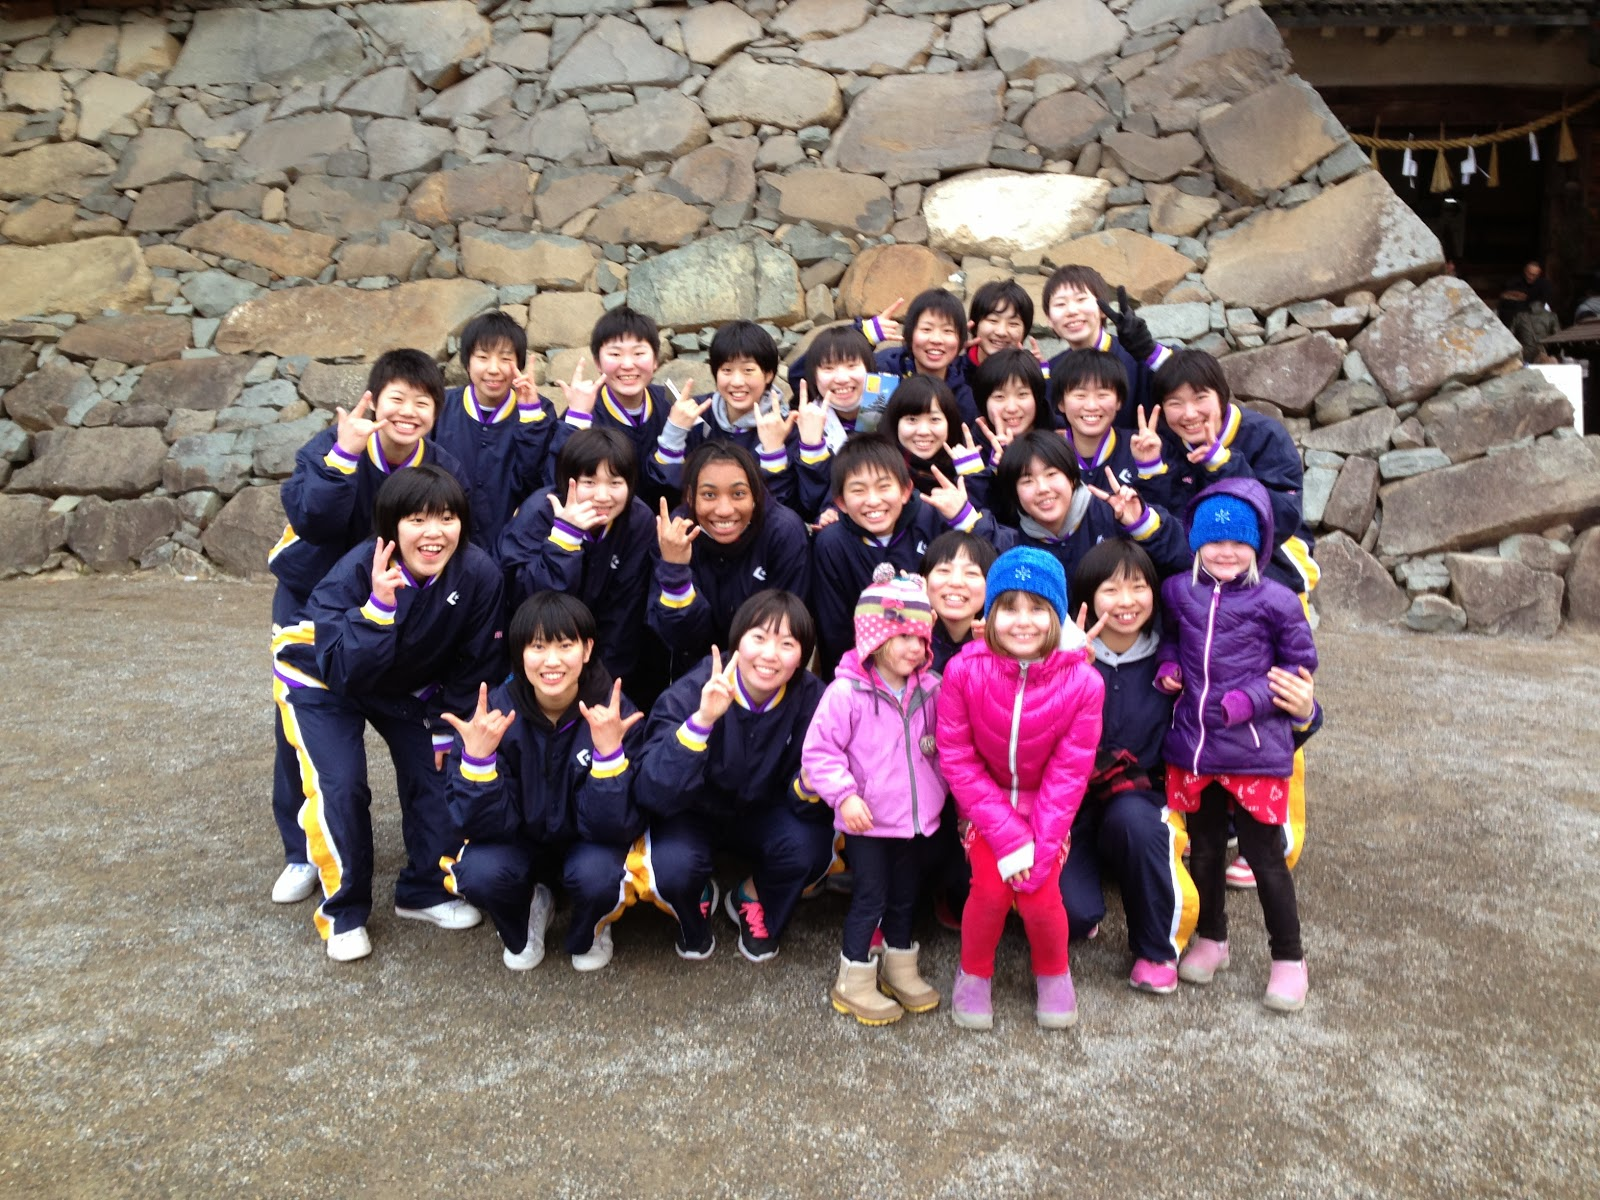 "<a href=""http://vionm.com/"">Thailand</a> <a href=""http://vionm.com/things-to-do-in-bangkok-thailand/thailandhoneymoon-explore-the-beauty-of-koh-samui/"">Beach</a>: Nagano...Snow Monkeys Together With A Castle!"